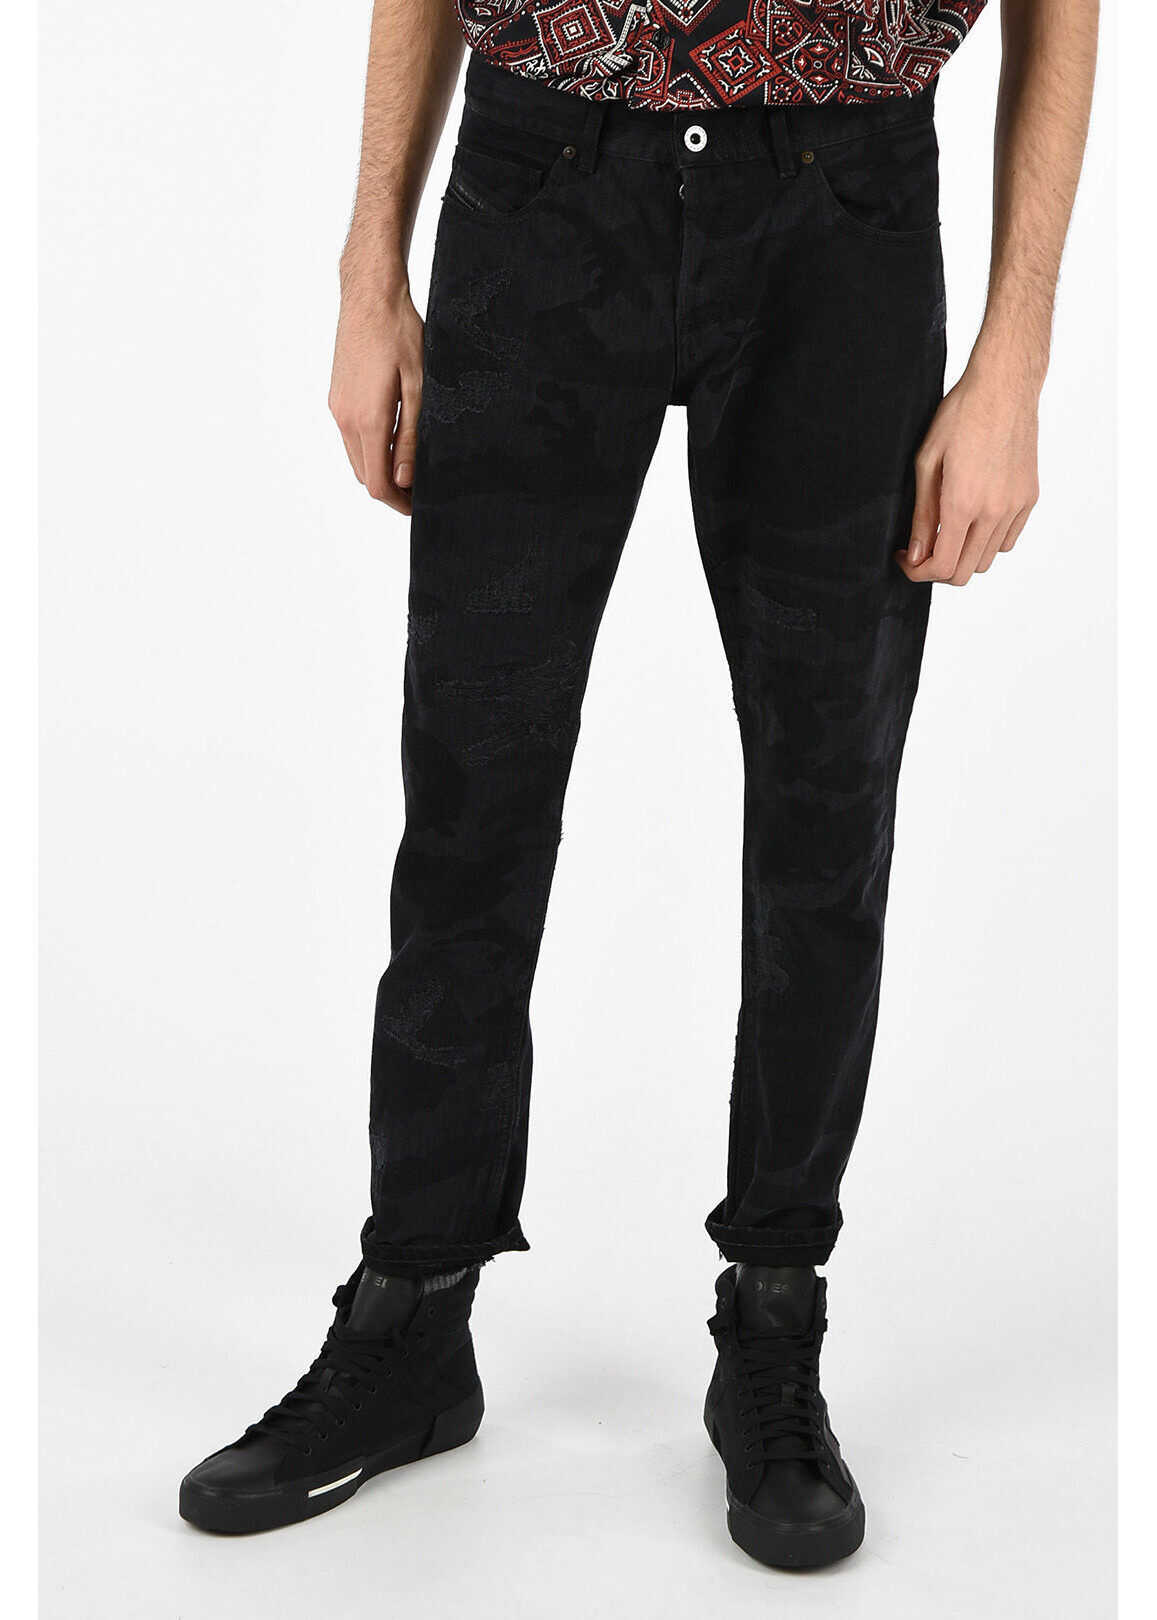 BLACK GOLD 17cm camouflage TYPE-2813 Slim fit jeans thumbnail